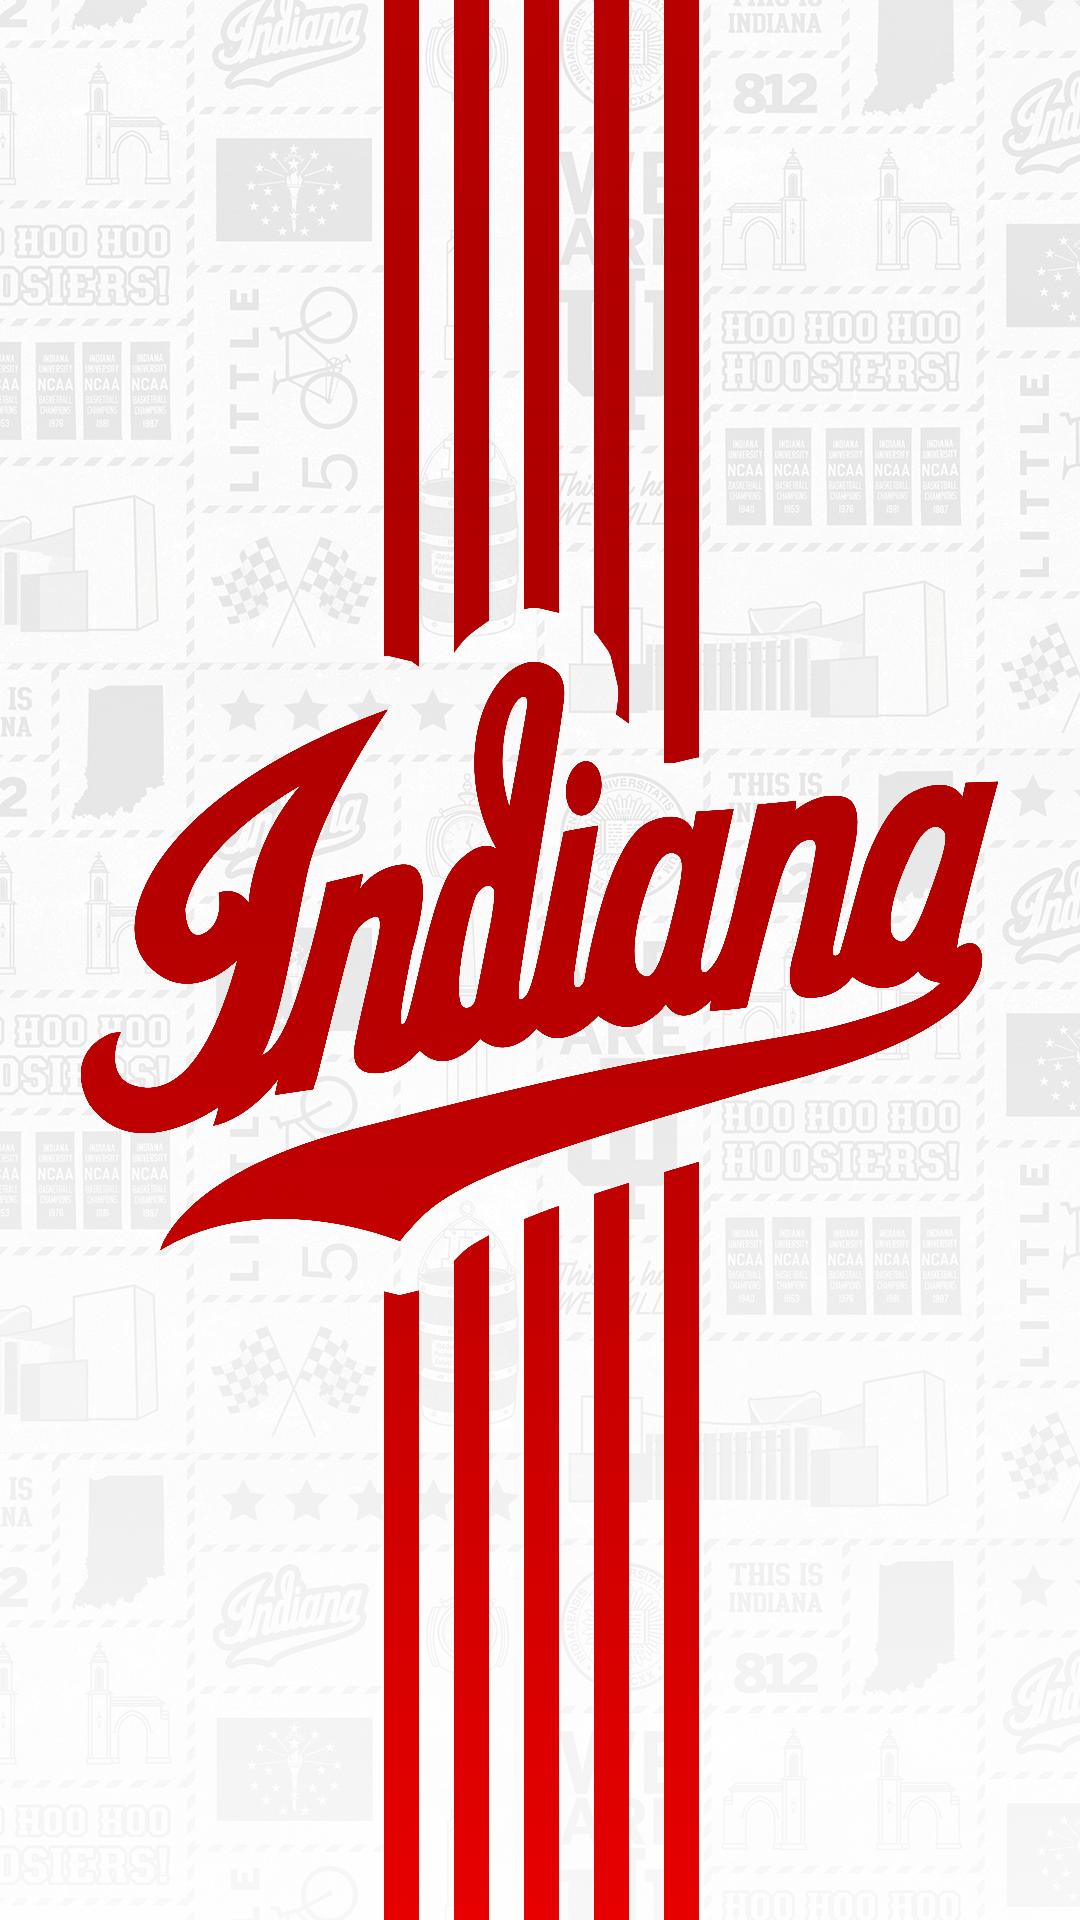 Phone Wallpapers   Indiana University Athletics 1080x1920